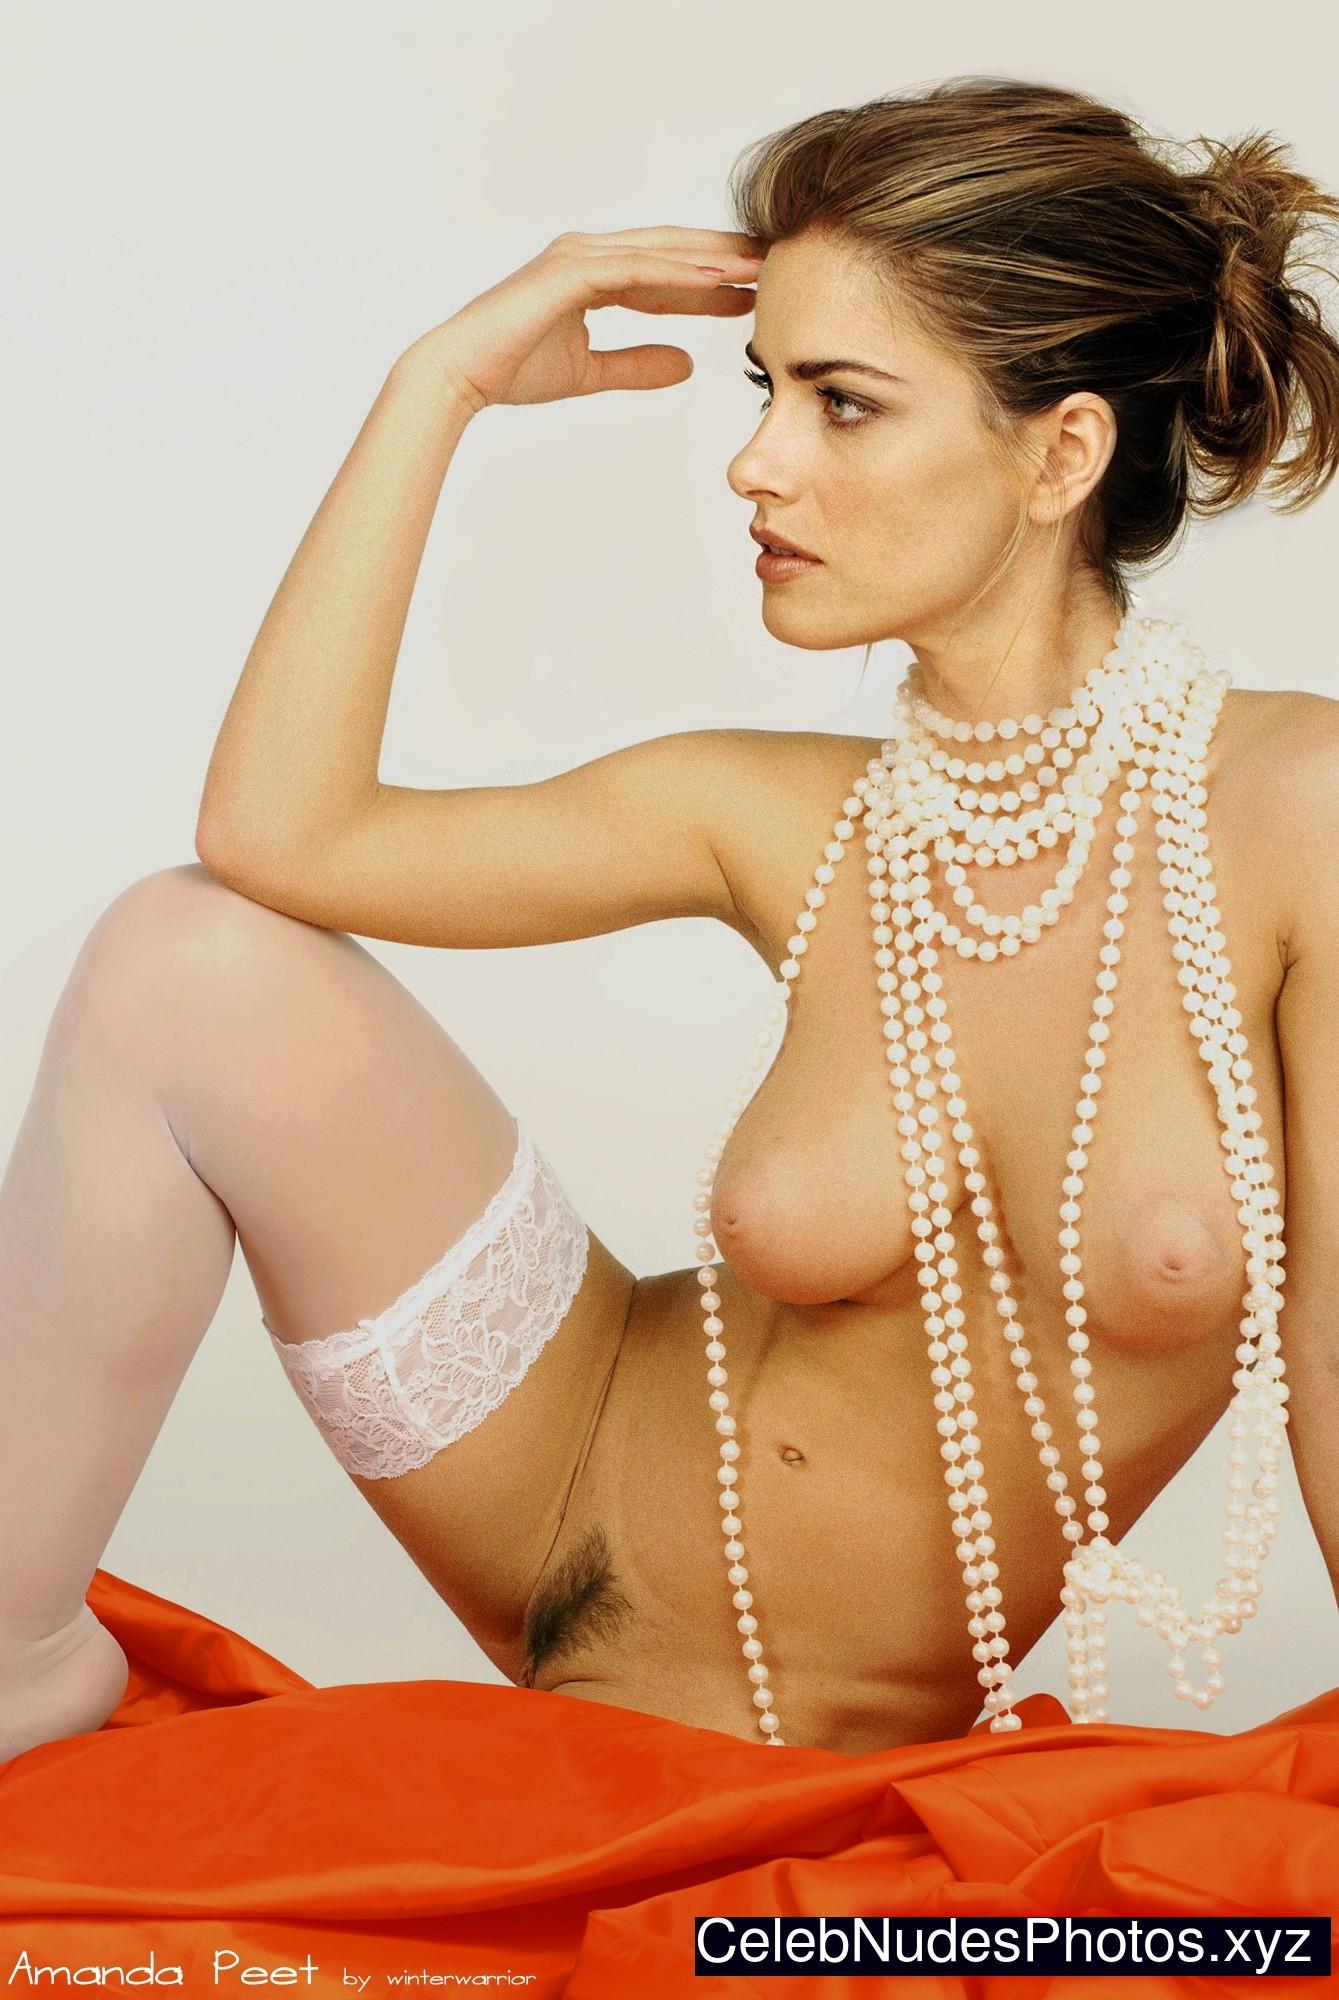 Naked Amanda Peet Nude Photos Scenes